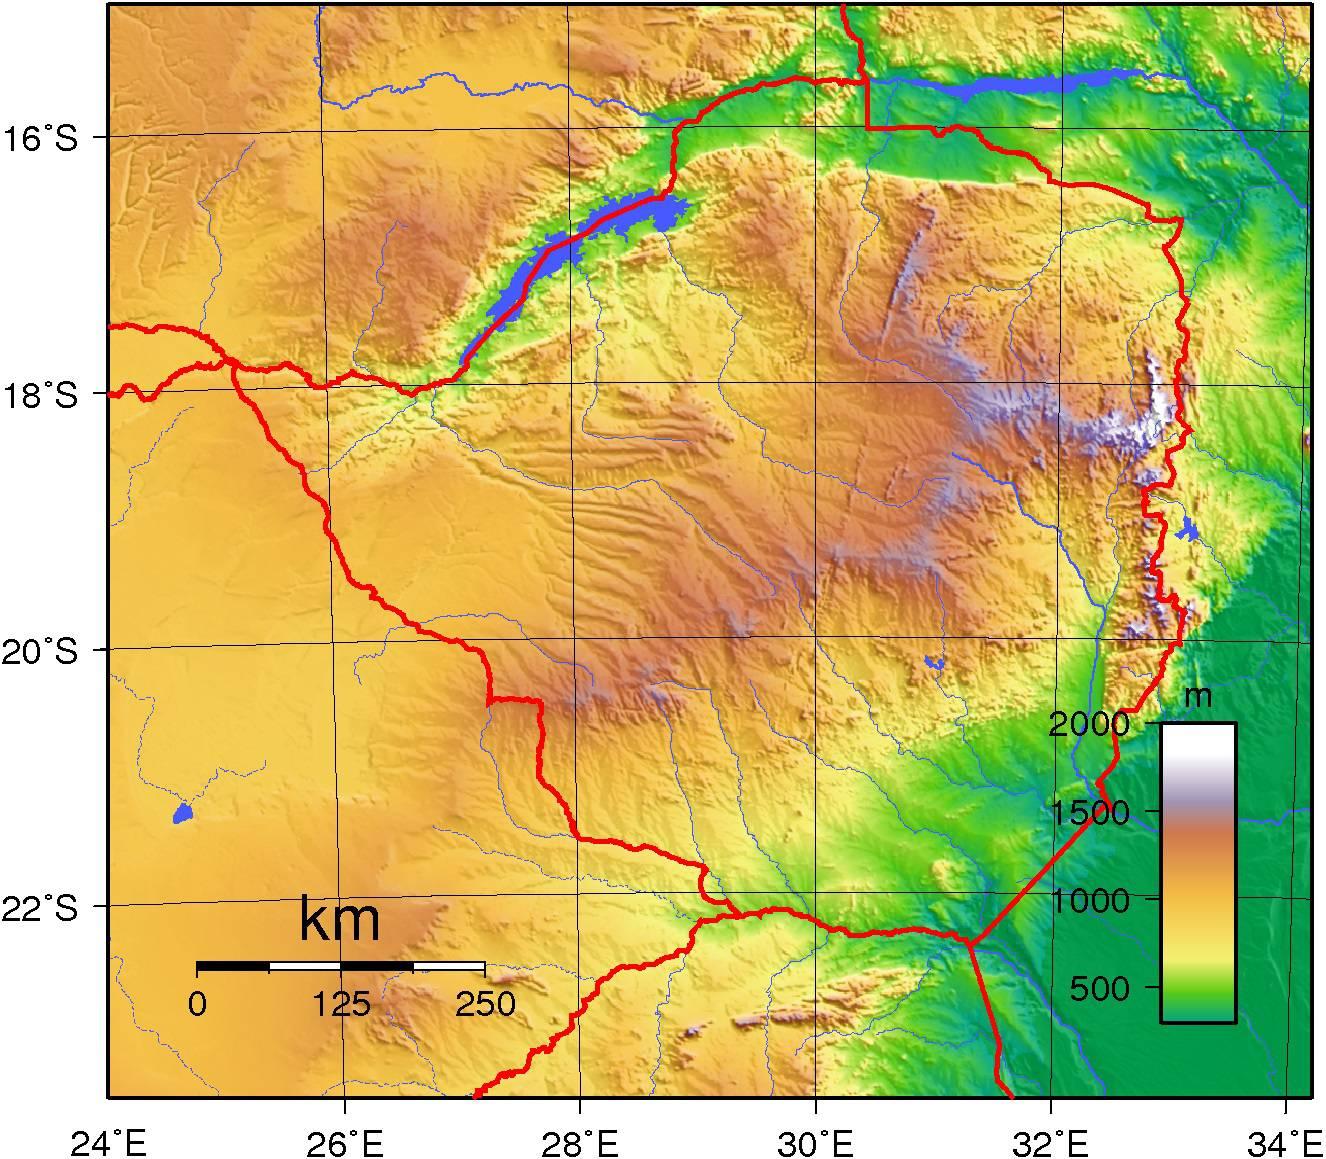 Carte du relief du Zimbabwe